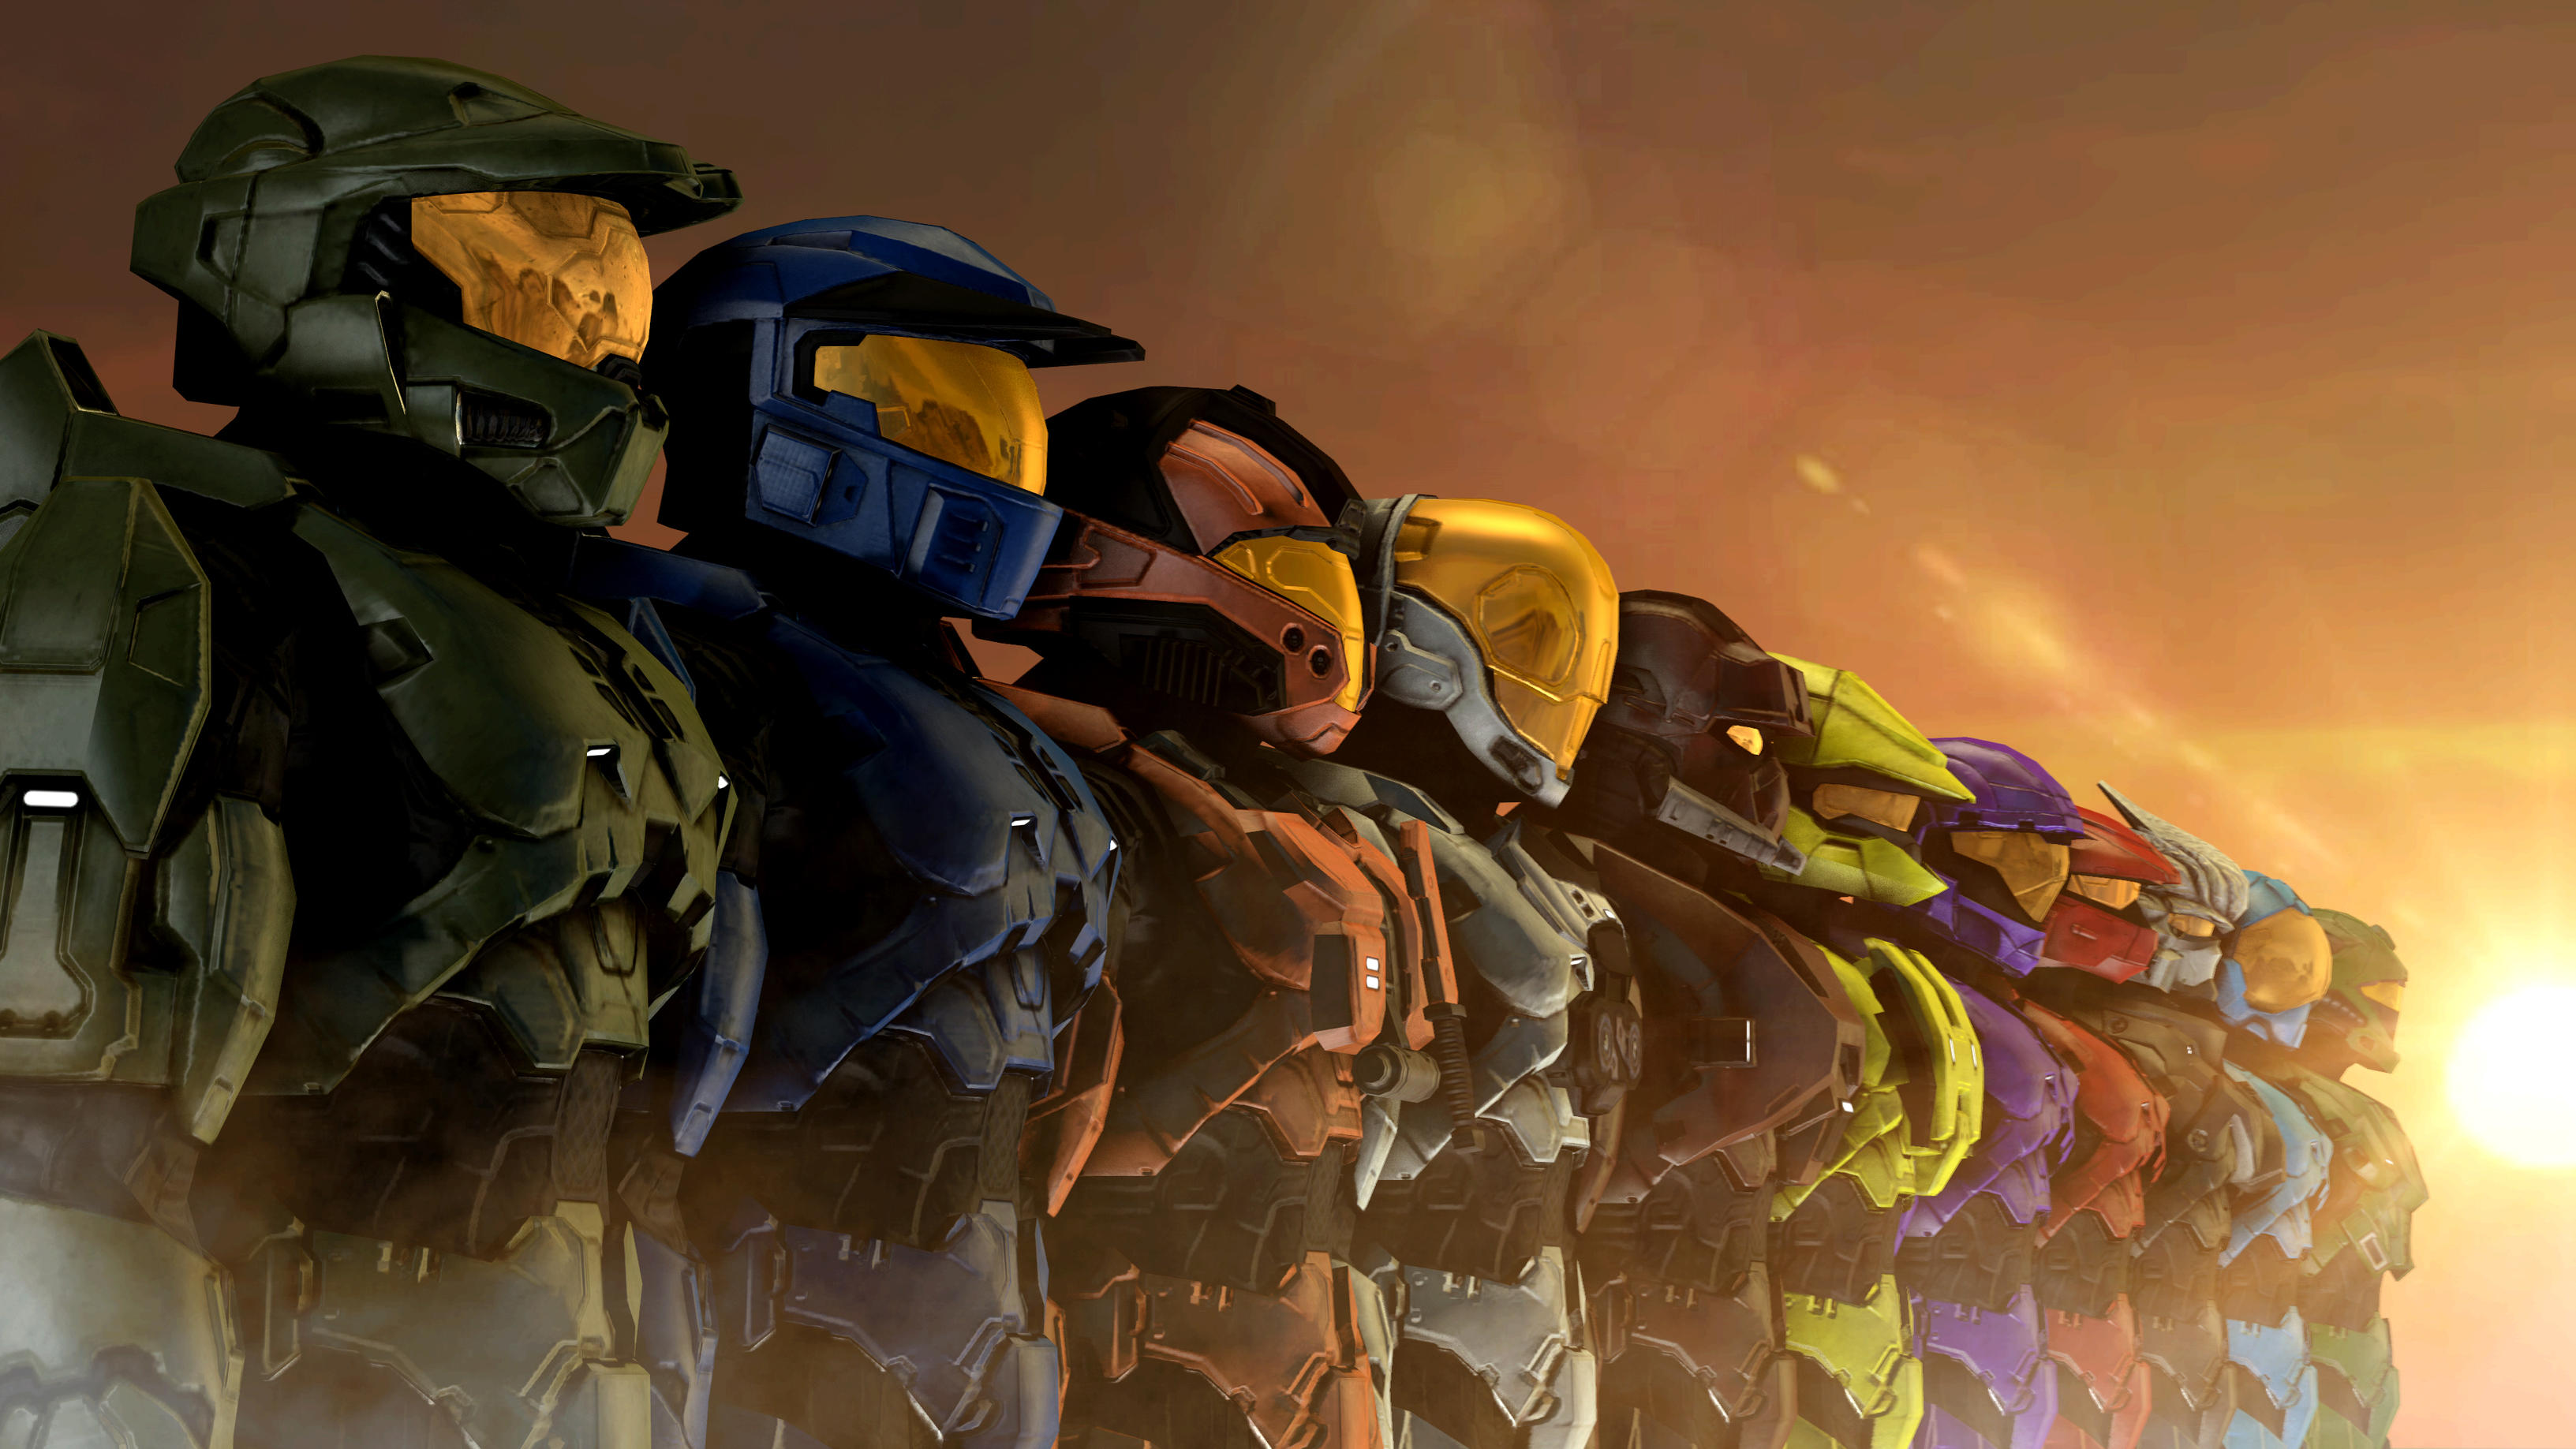 Halo 3 - Ten Years Ago [SFM/4K] by Archangel470